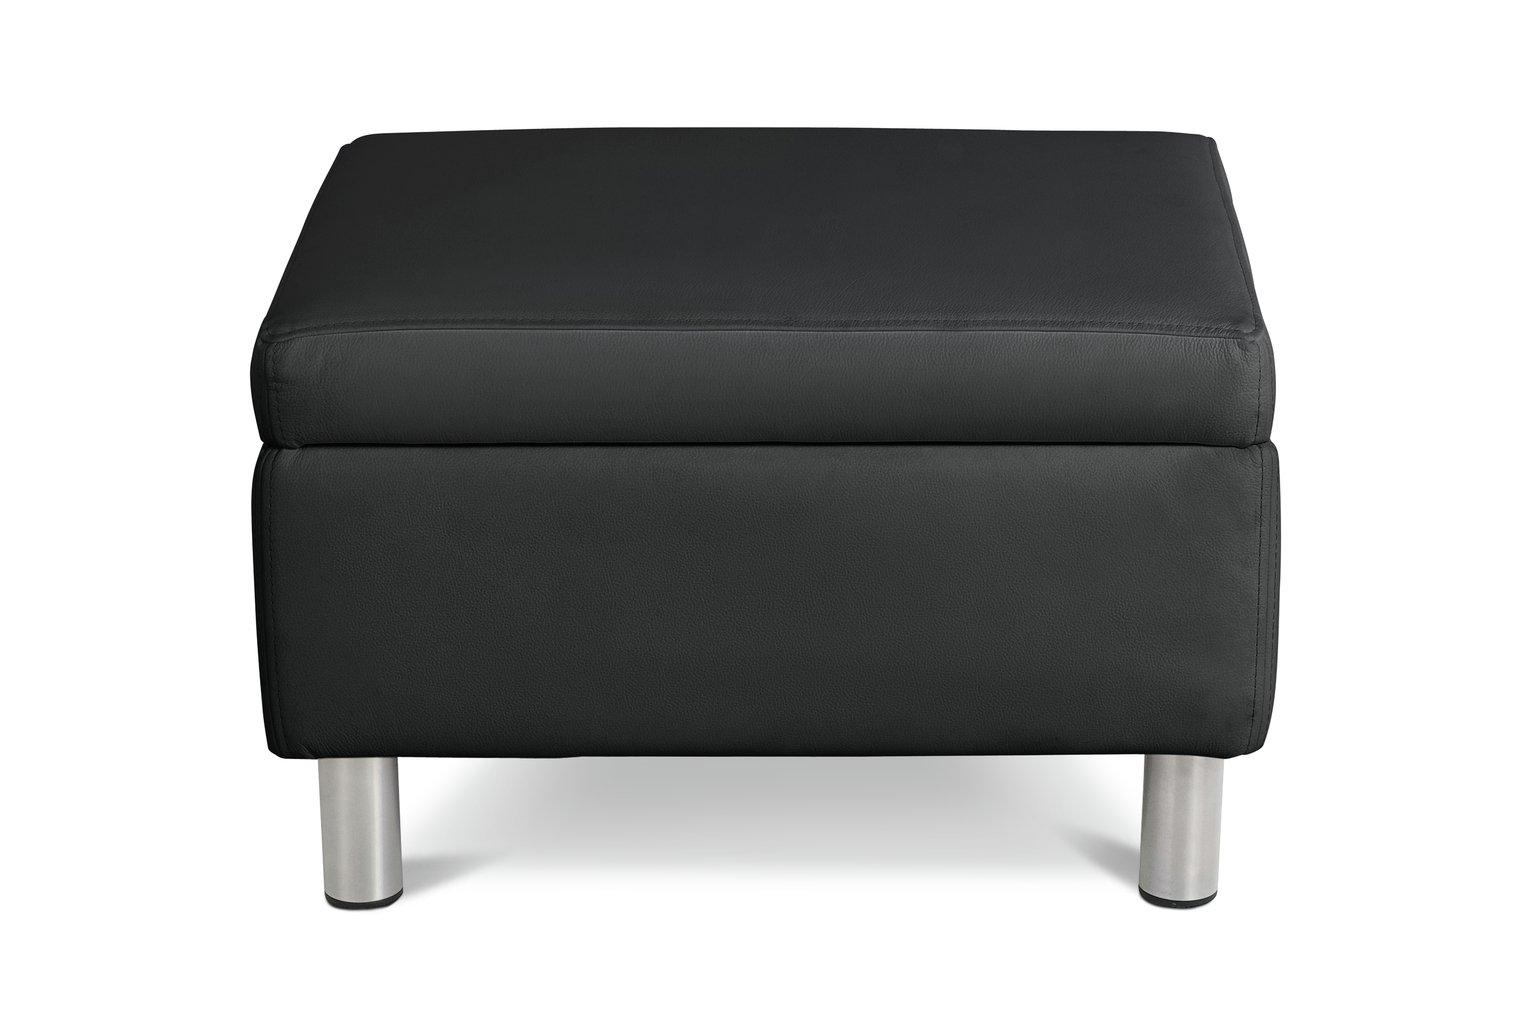 Habitat Moda Faux Leather Storage Footstool - Black